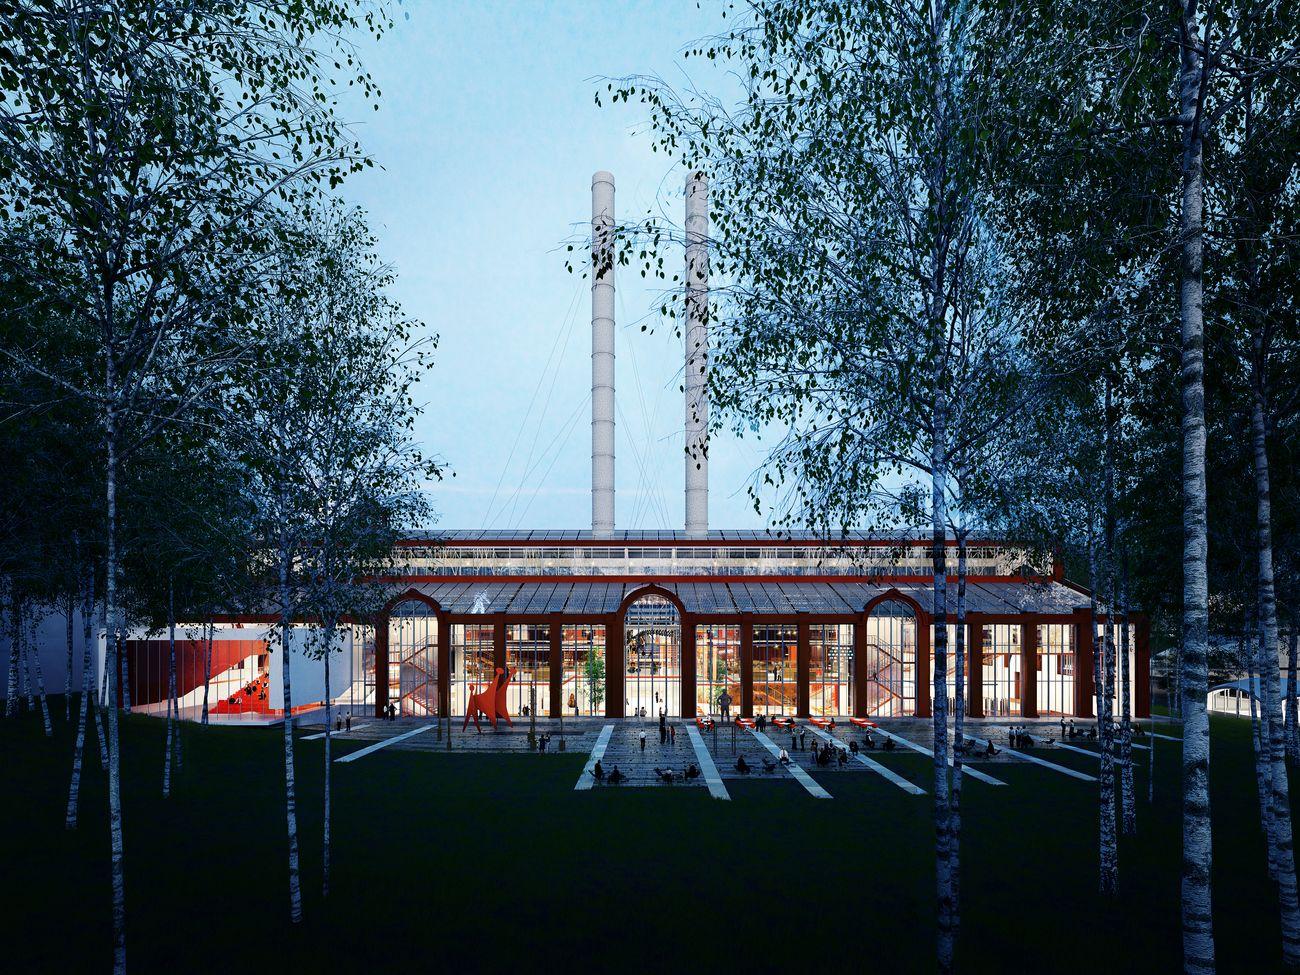 RPBW con APEX Project Bureau, GES 2 project, Mosca © RPBW, rendering by L'Autre Image